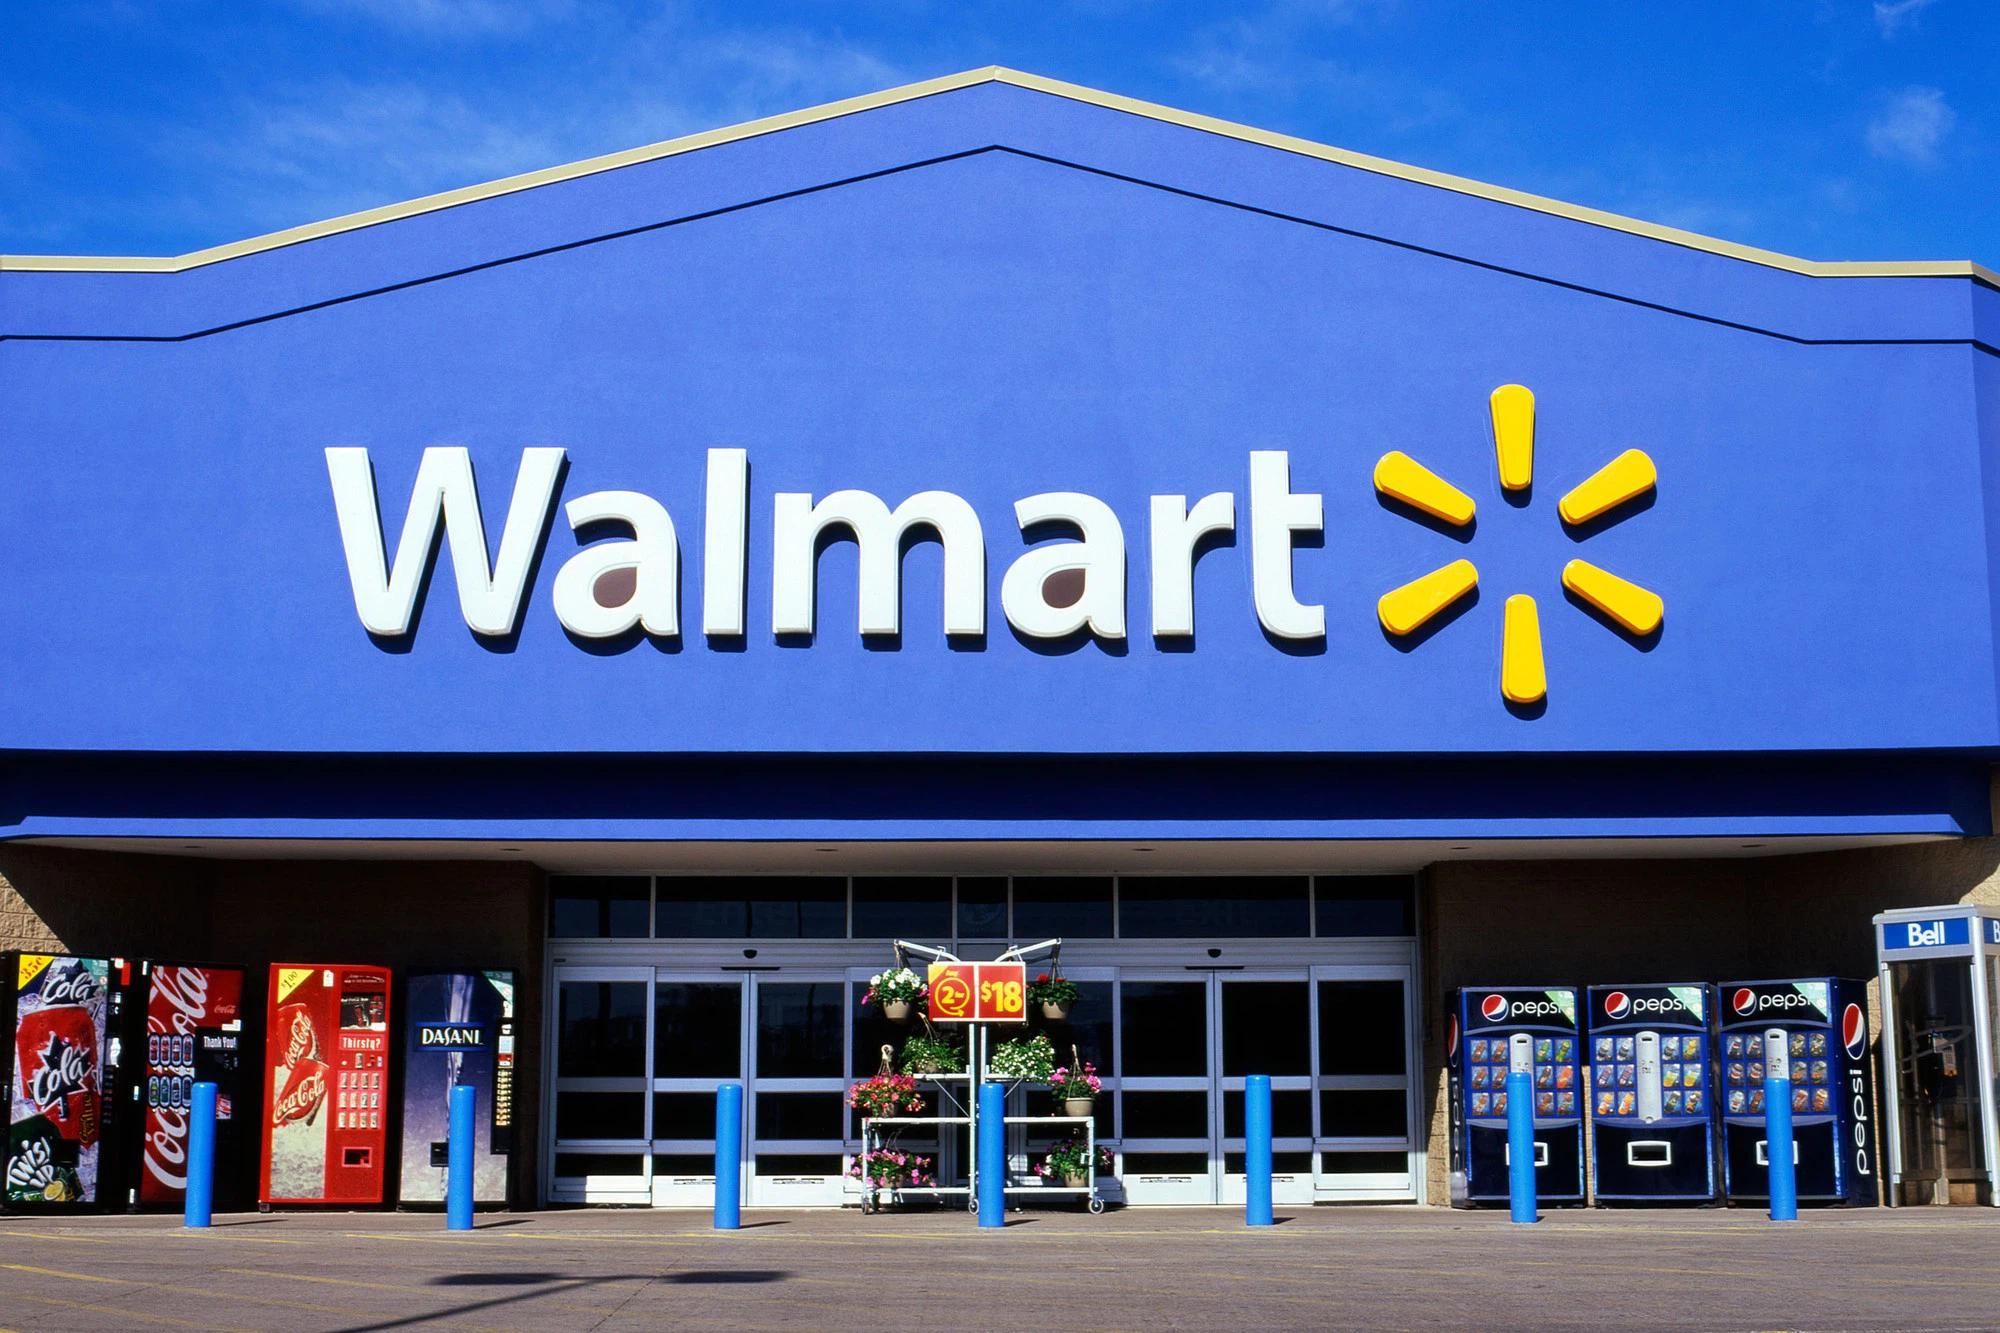 Walmart 也能買到比特幣!200 台比特幣 ATM 進駐賣場門市